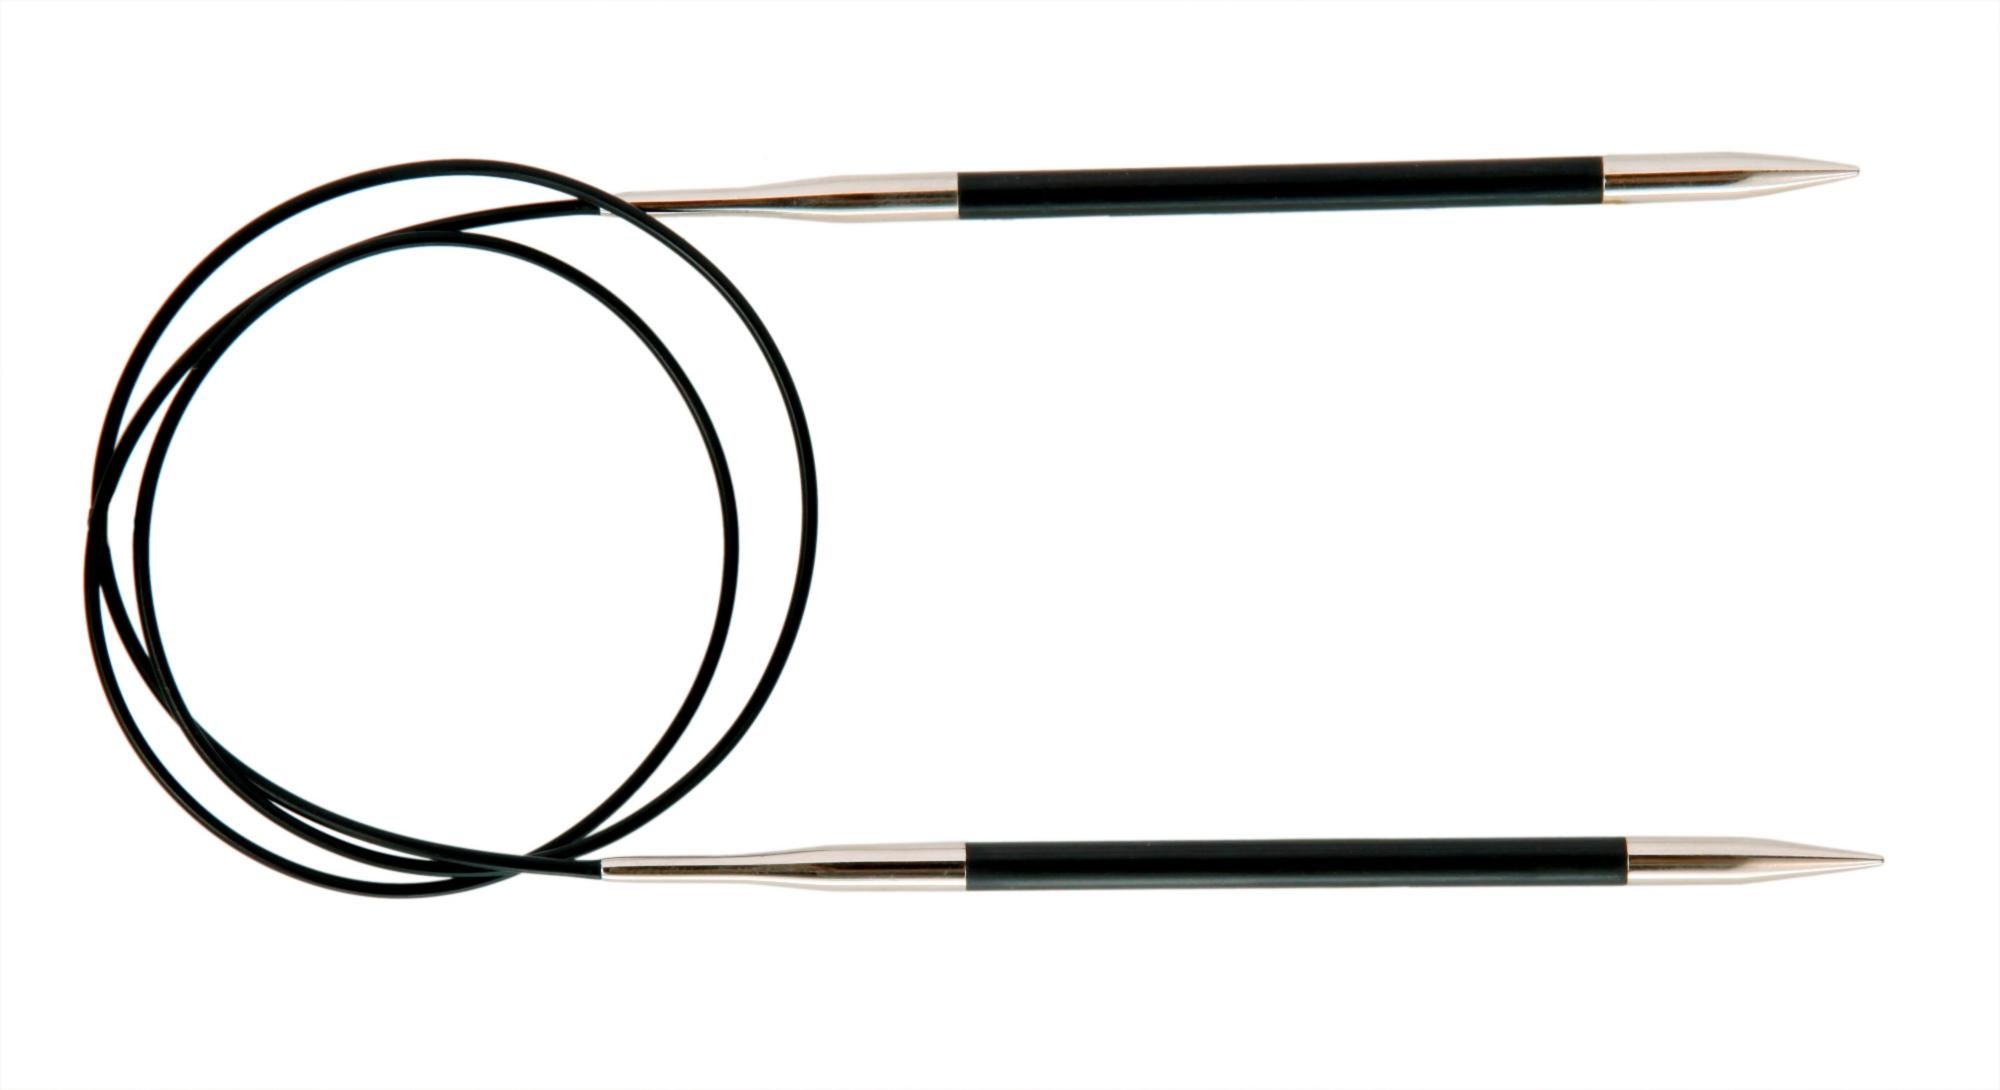 Спицы круговые 60 см Karbonz KnitPro, 41163, 2.75 мм